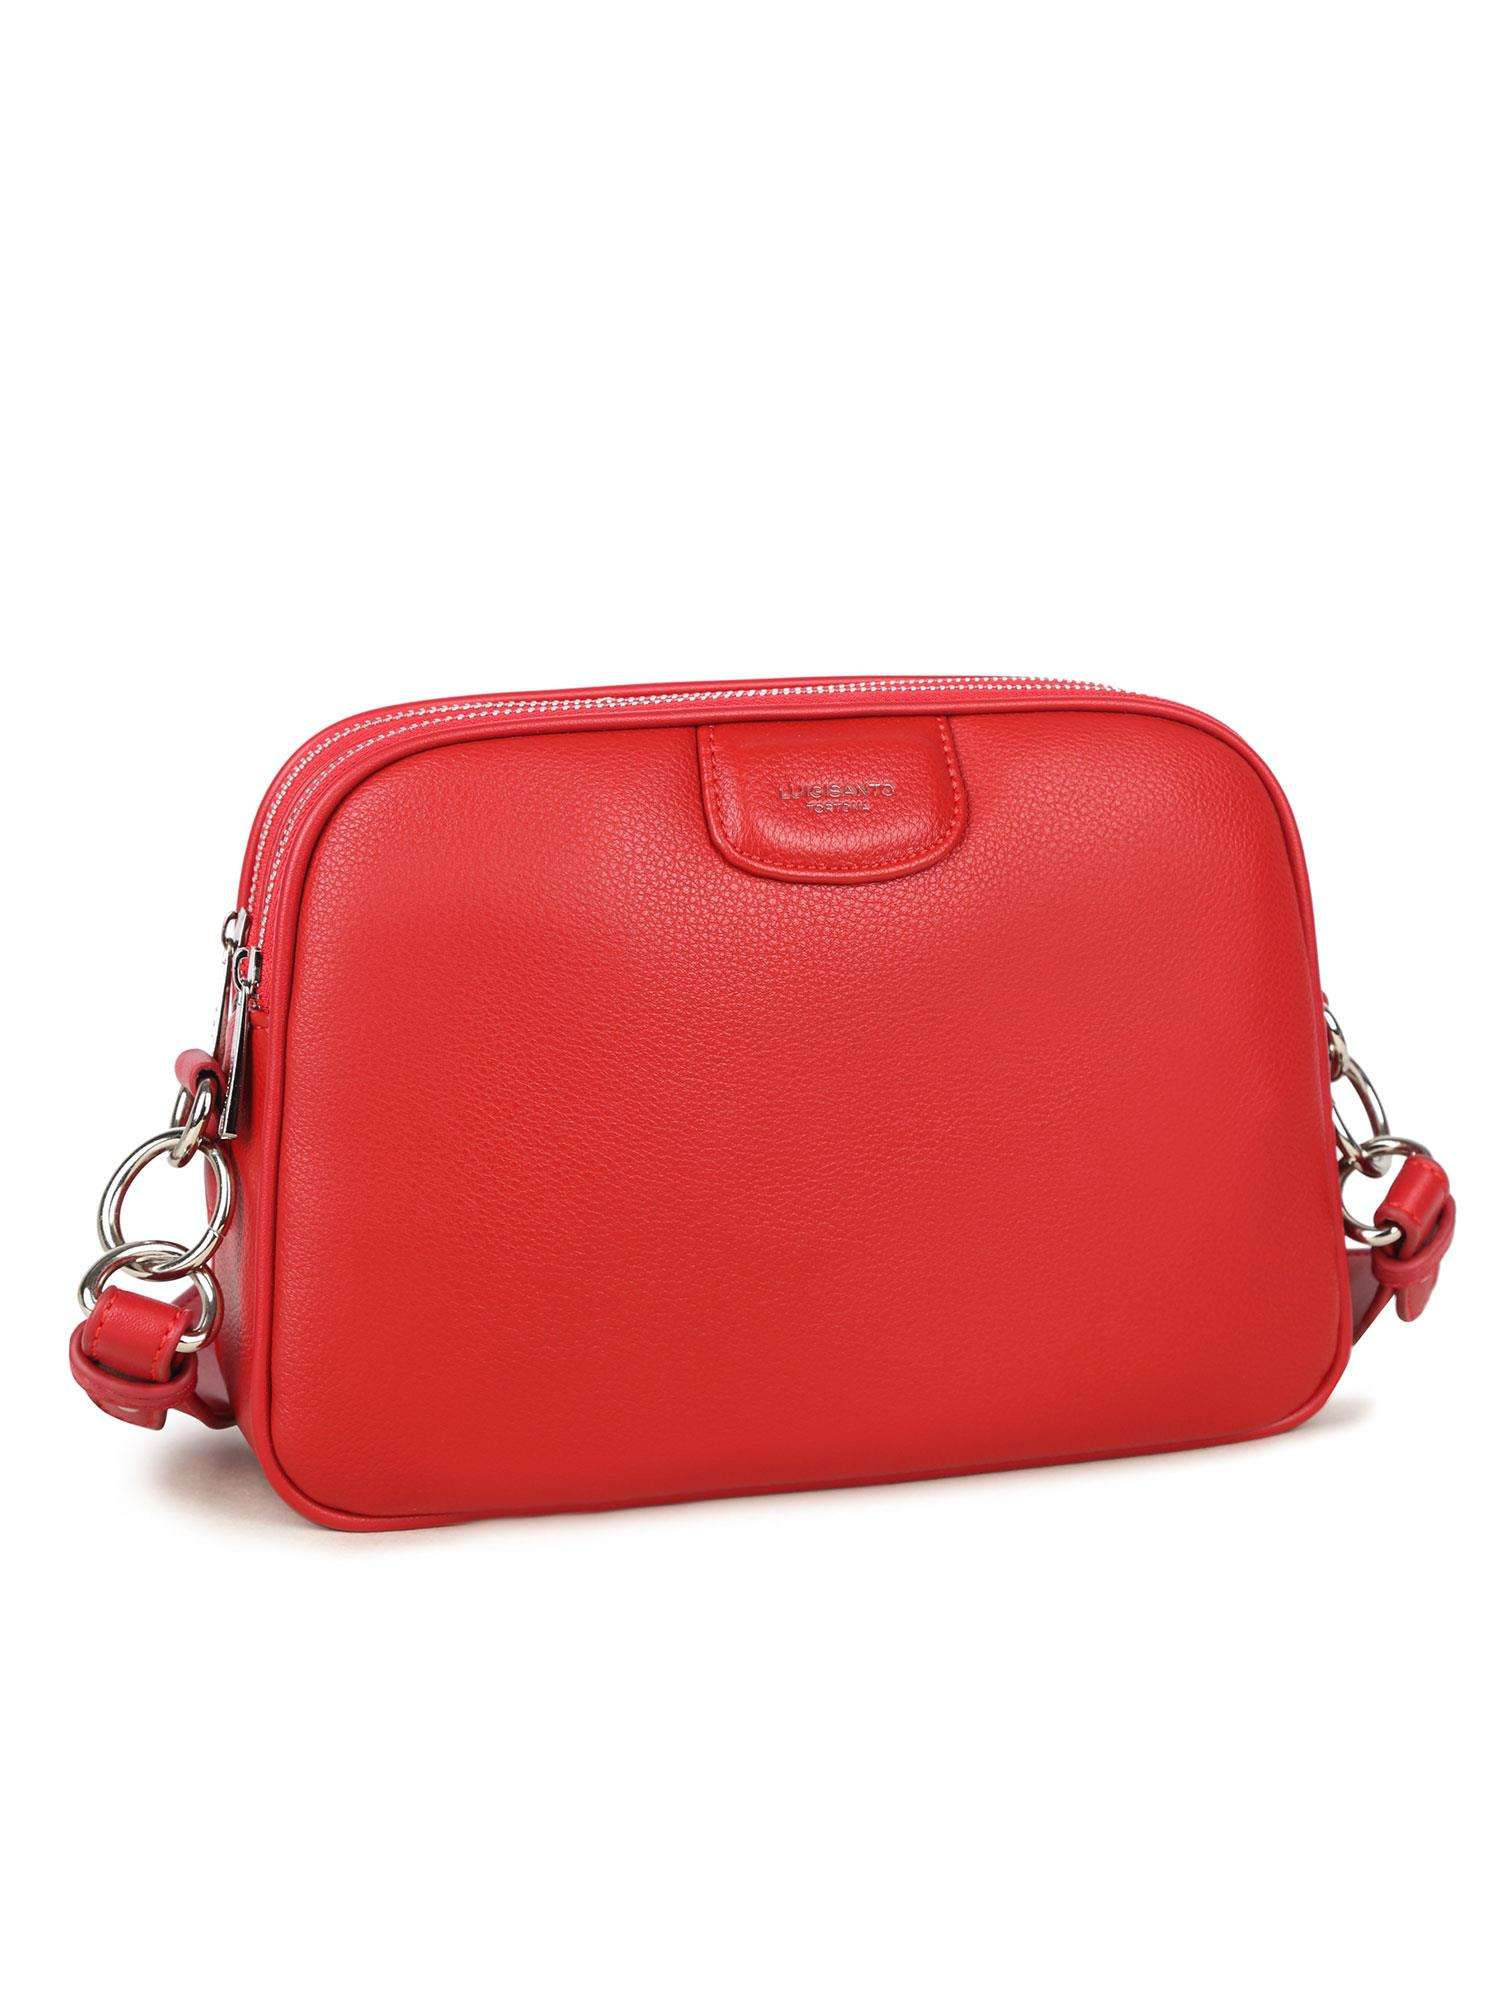 Dámska červená crossbody kabelka - UNI